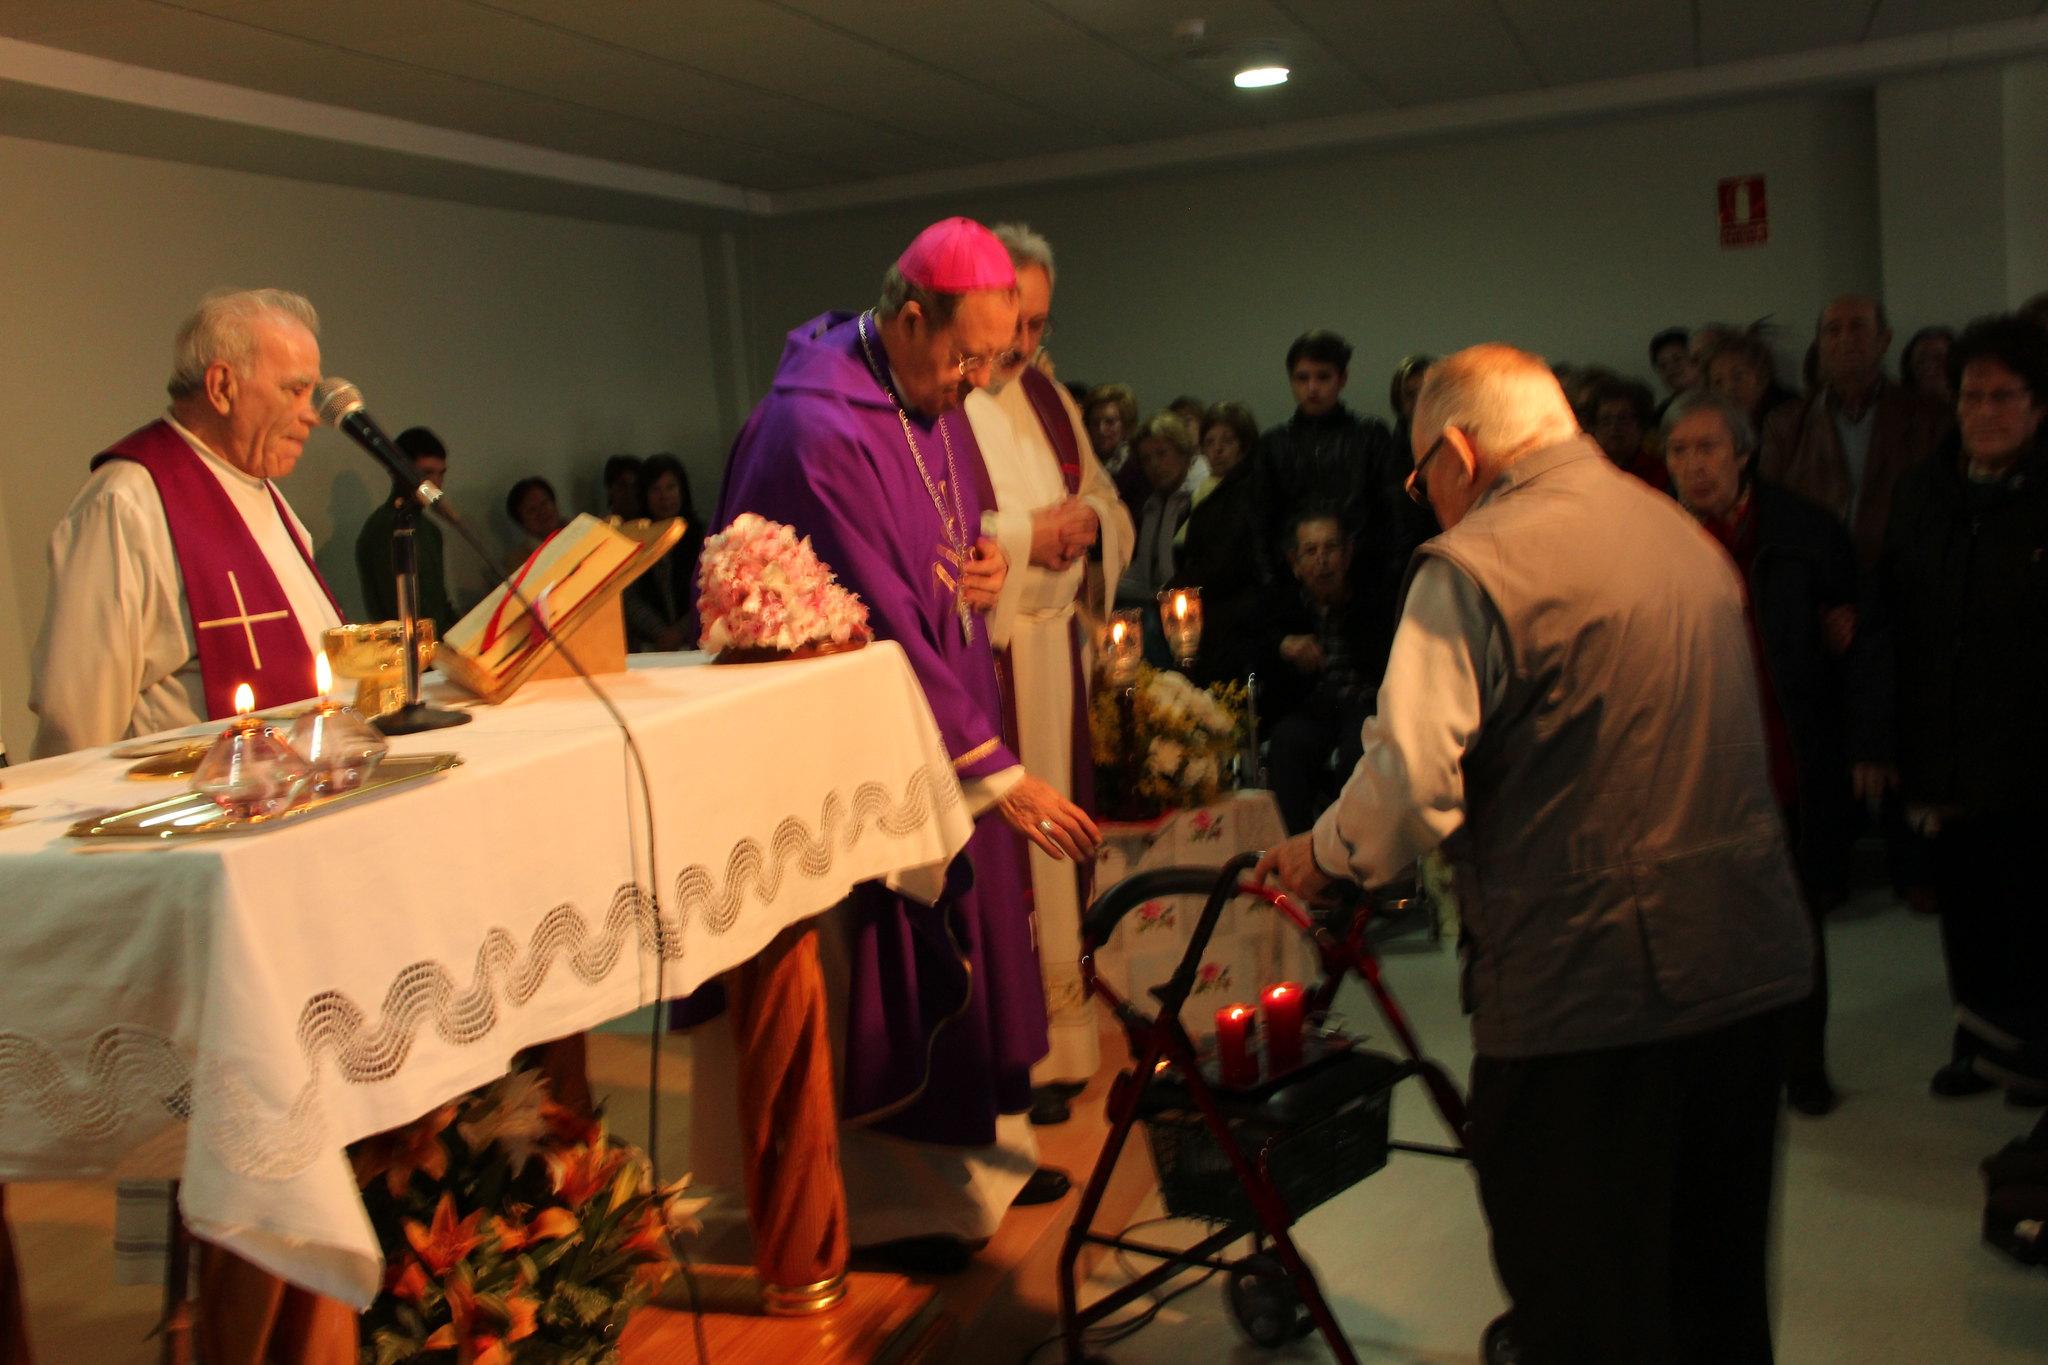 (2016-02-13) - Inauguración Virgen De Lourdes, La Molineta - Archivo La Molineta (035)